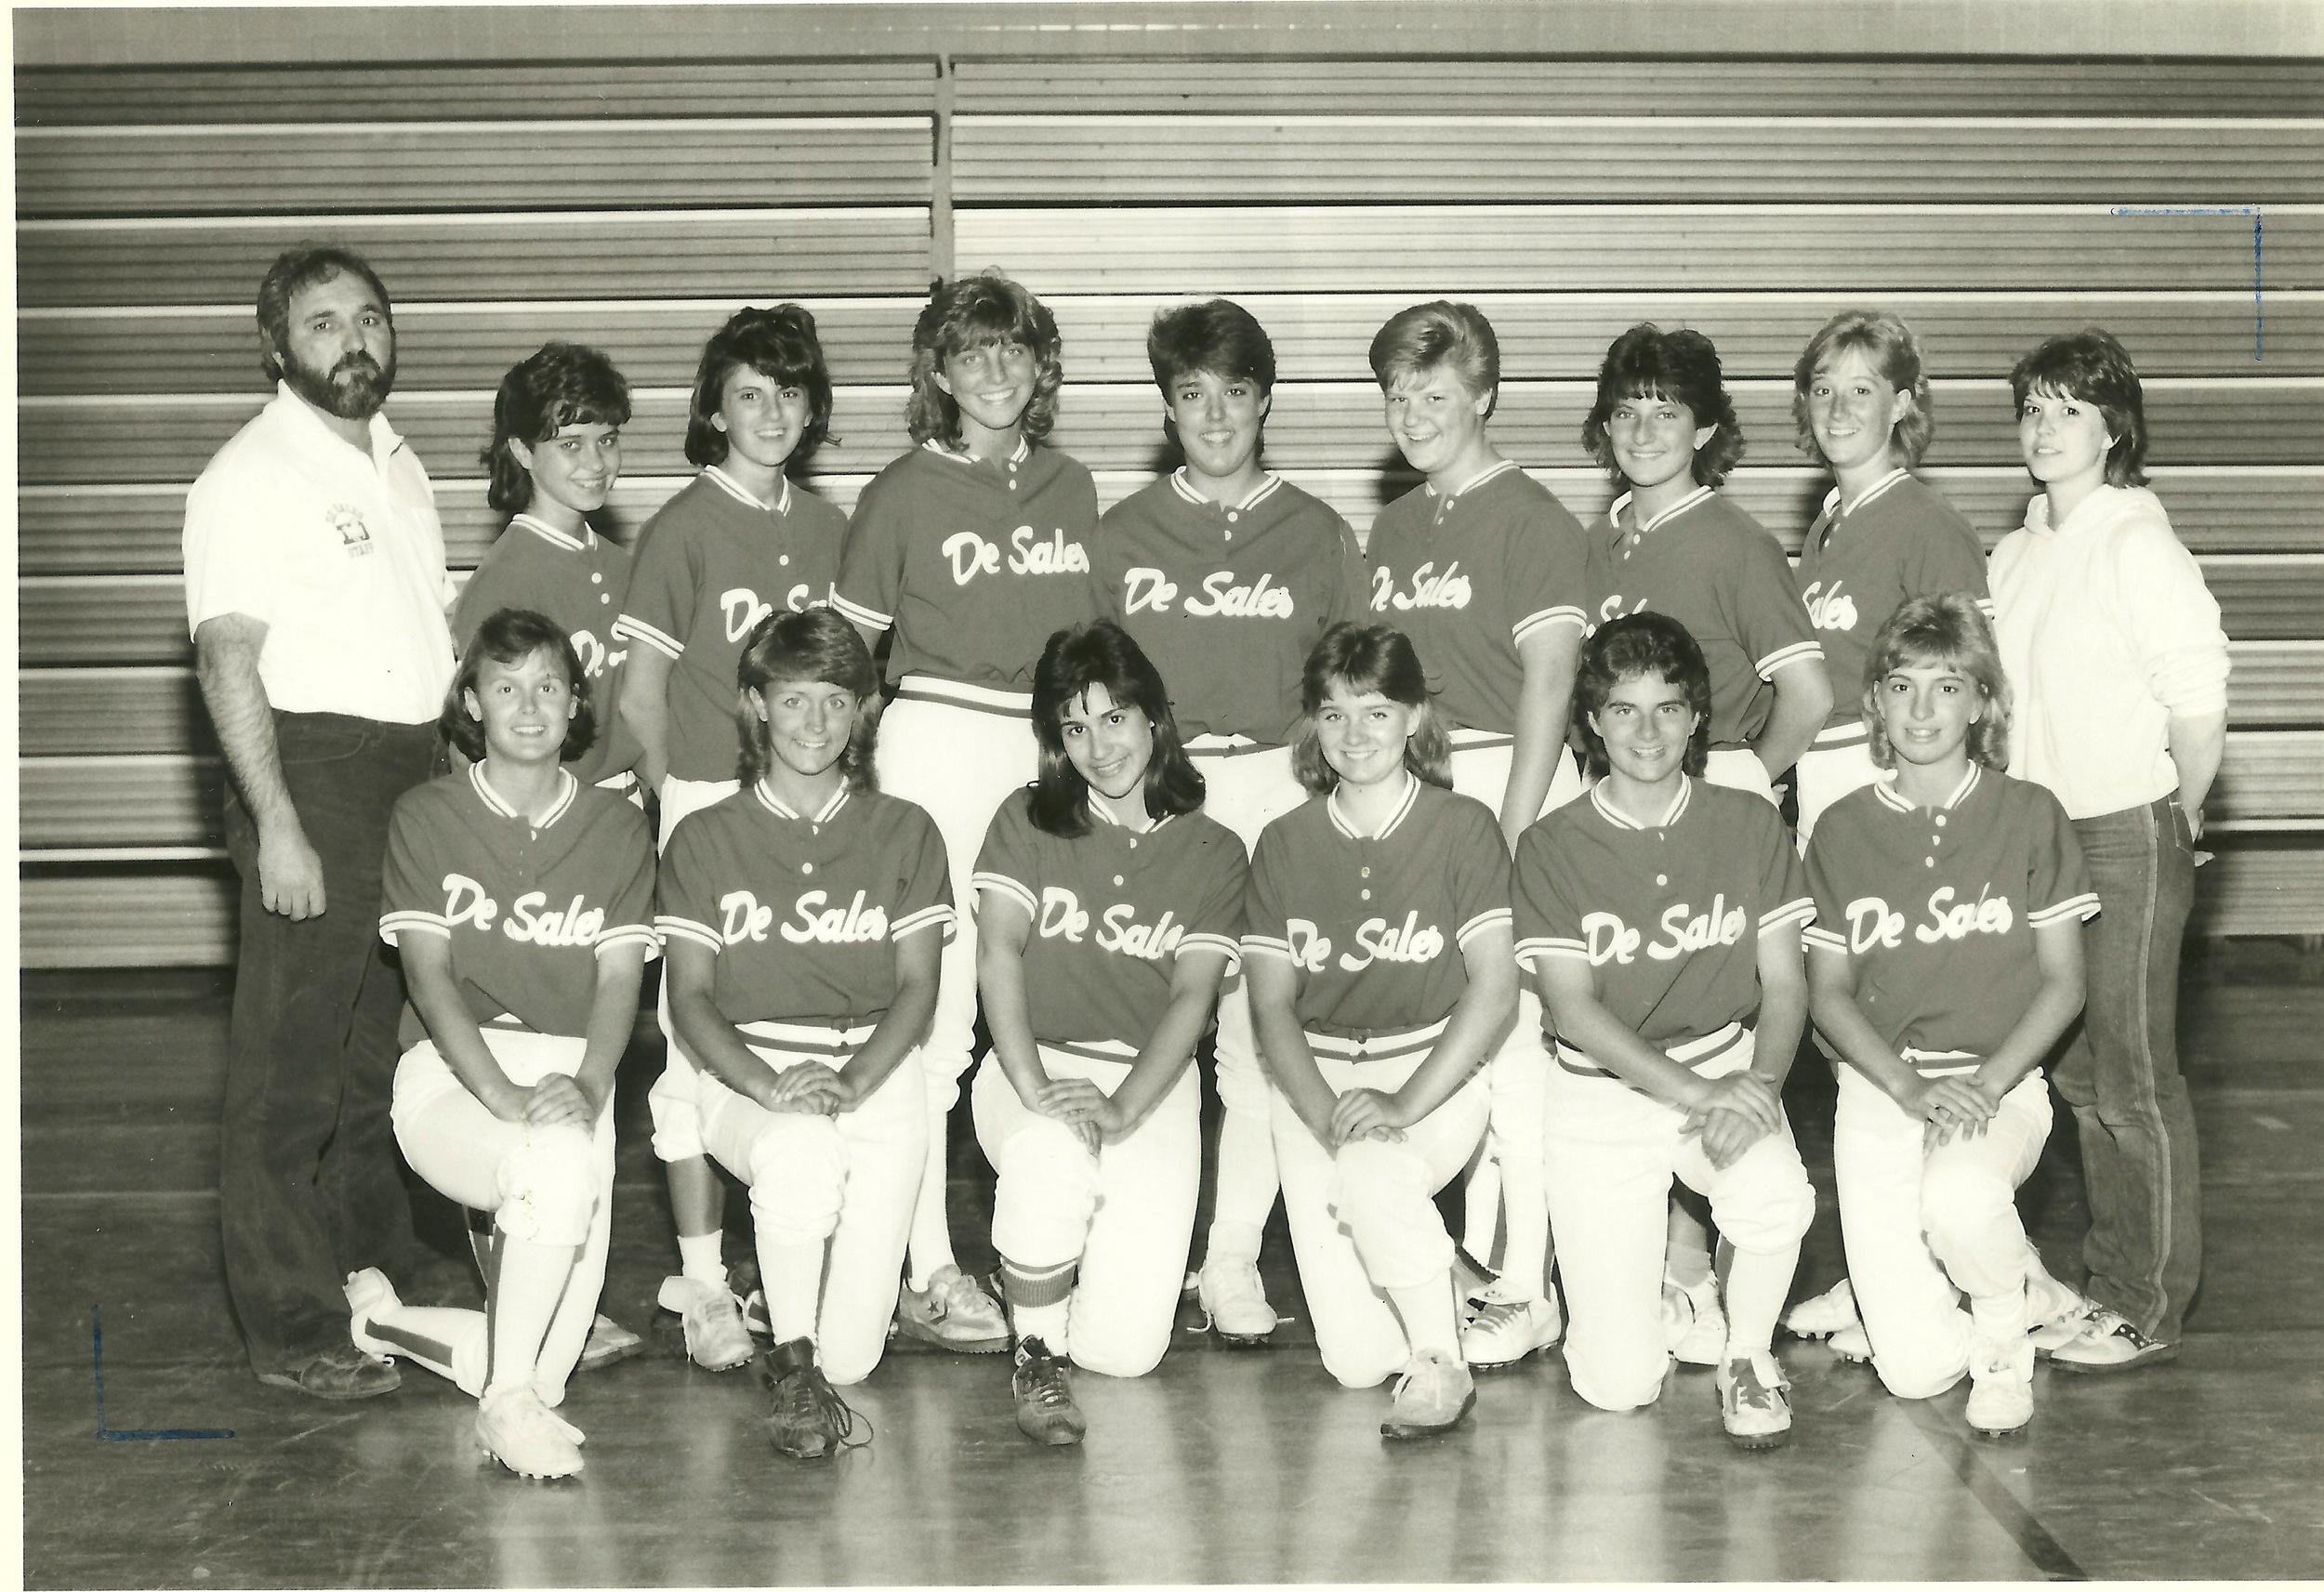 1986 Regional Runner-up